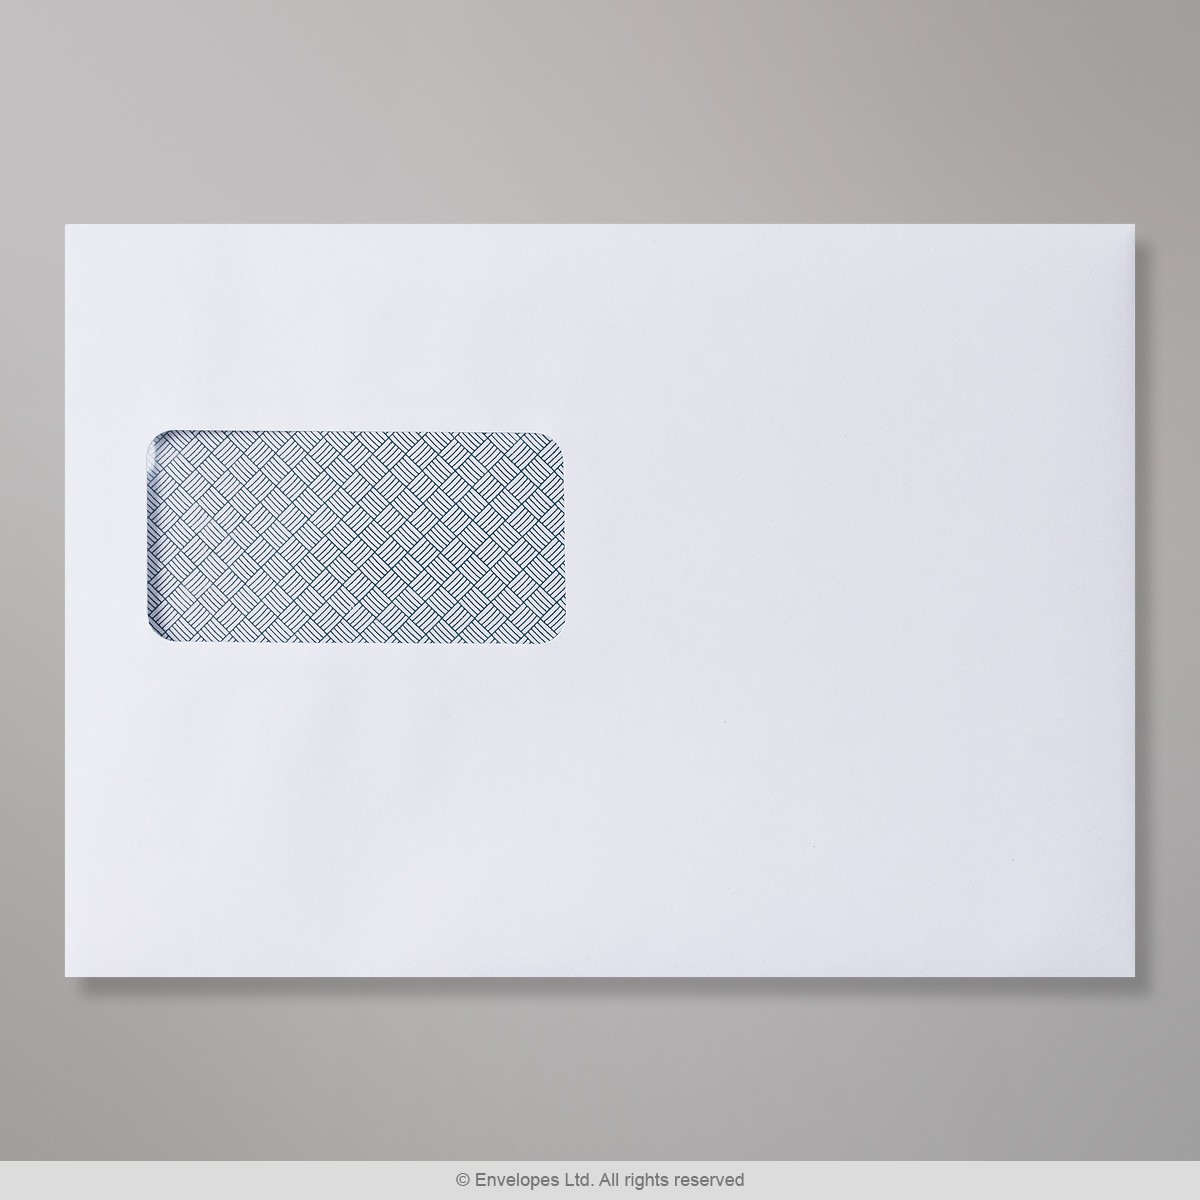 162x229 mm (C5) Busta bianca garantita per stampanti laser